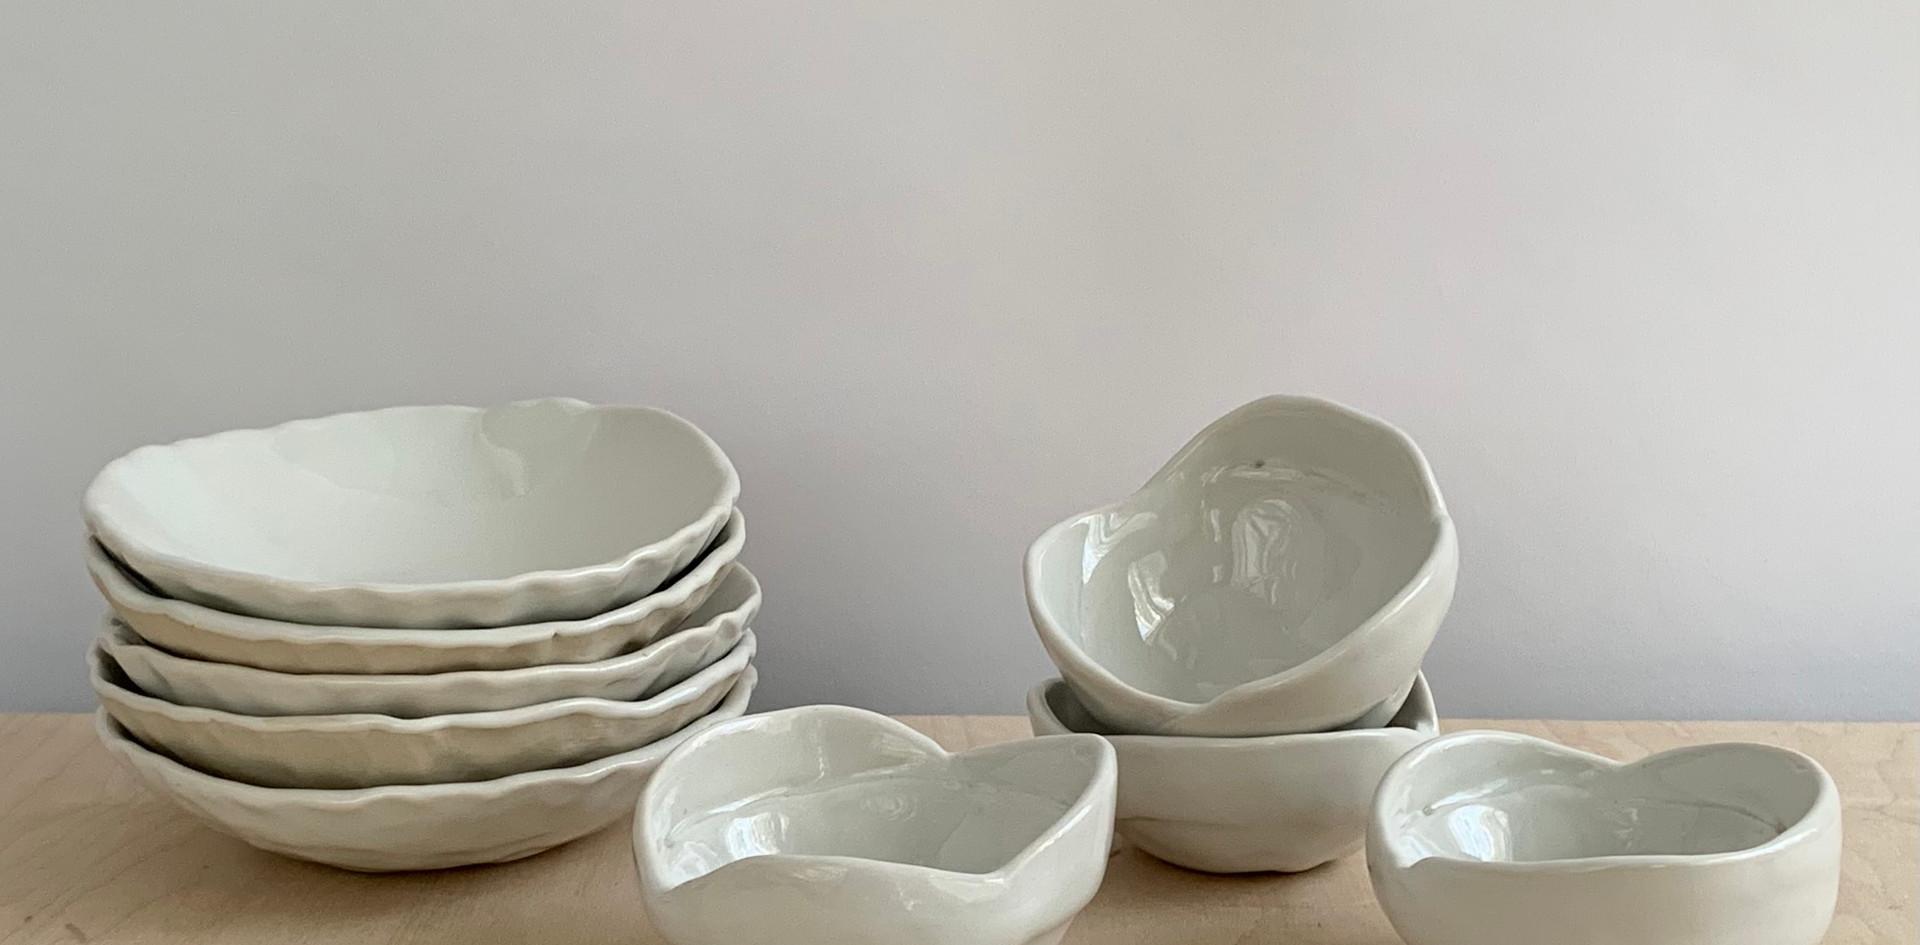 Ice Cream Bowls & Ramekins, Solid Glossy White